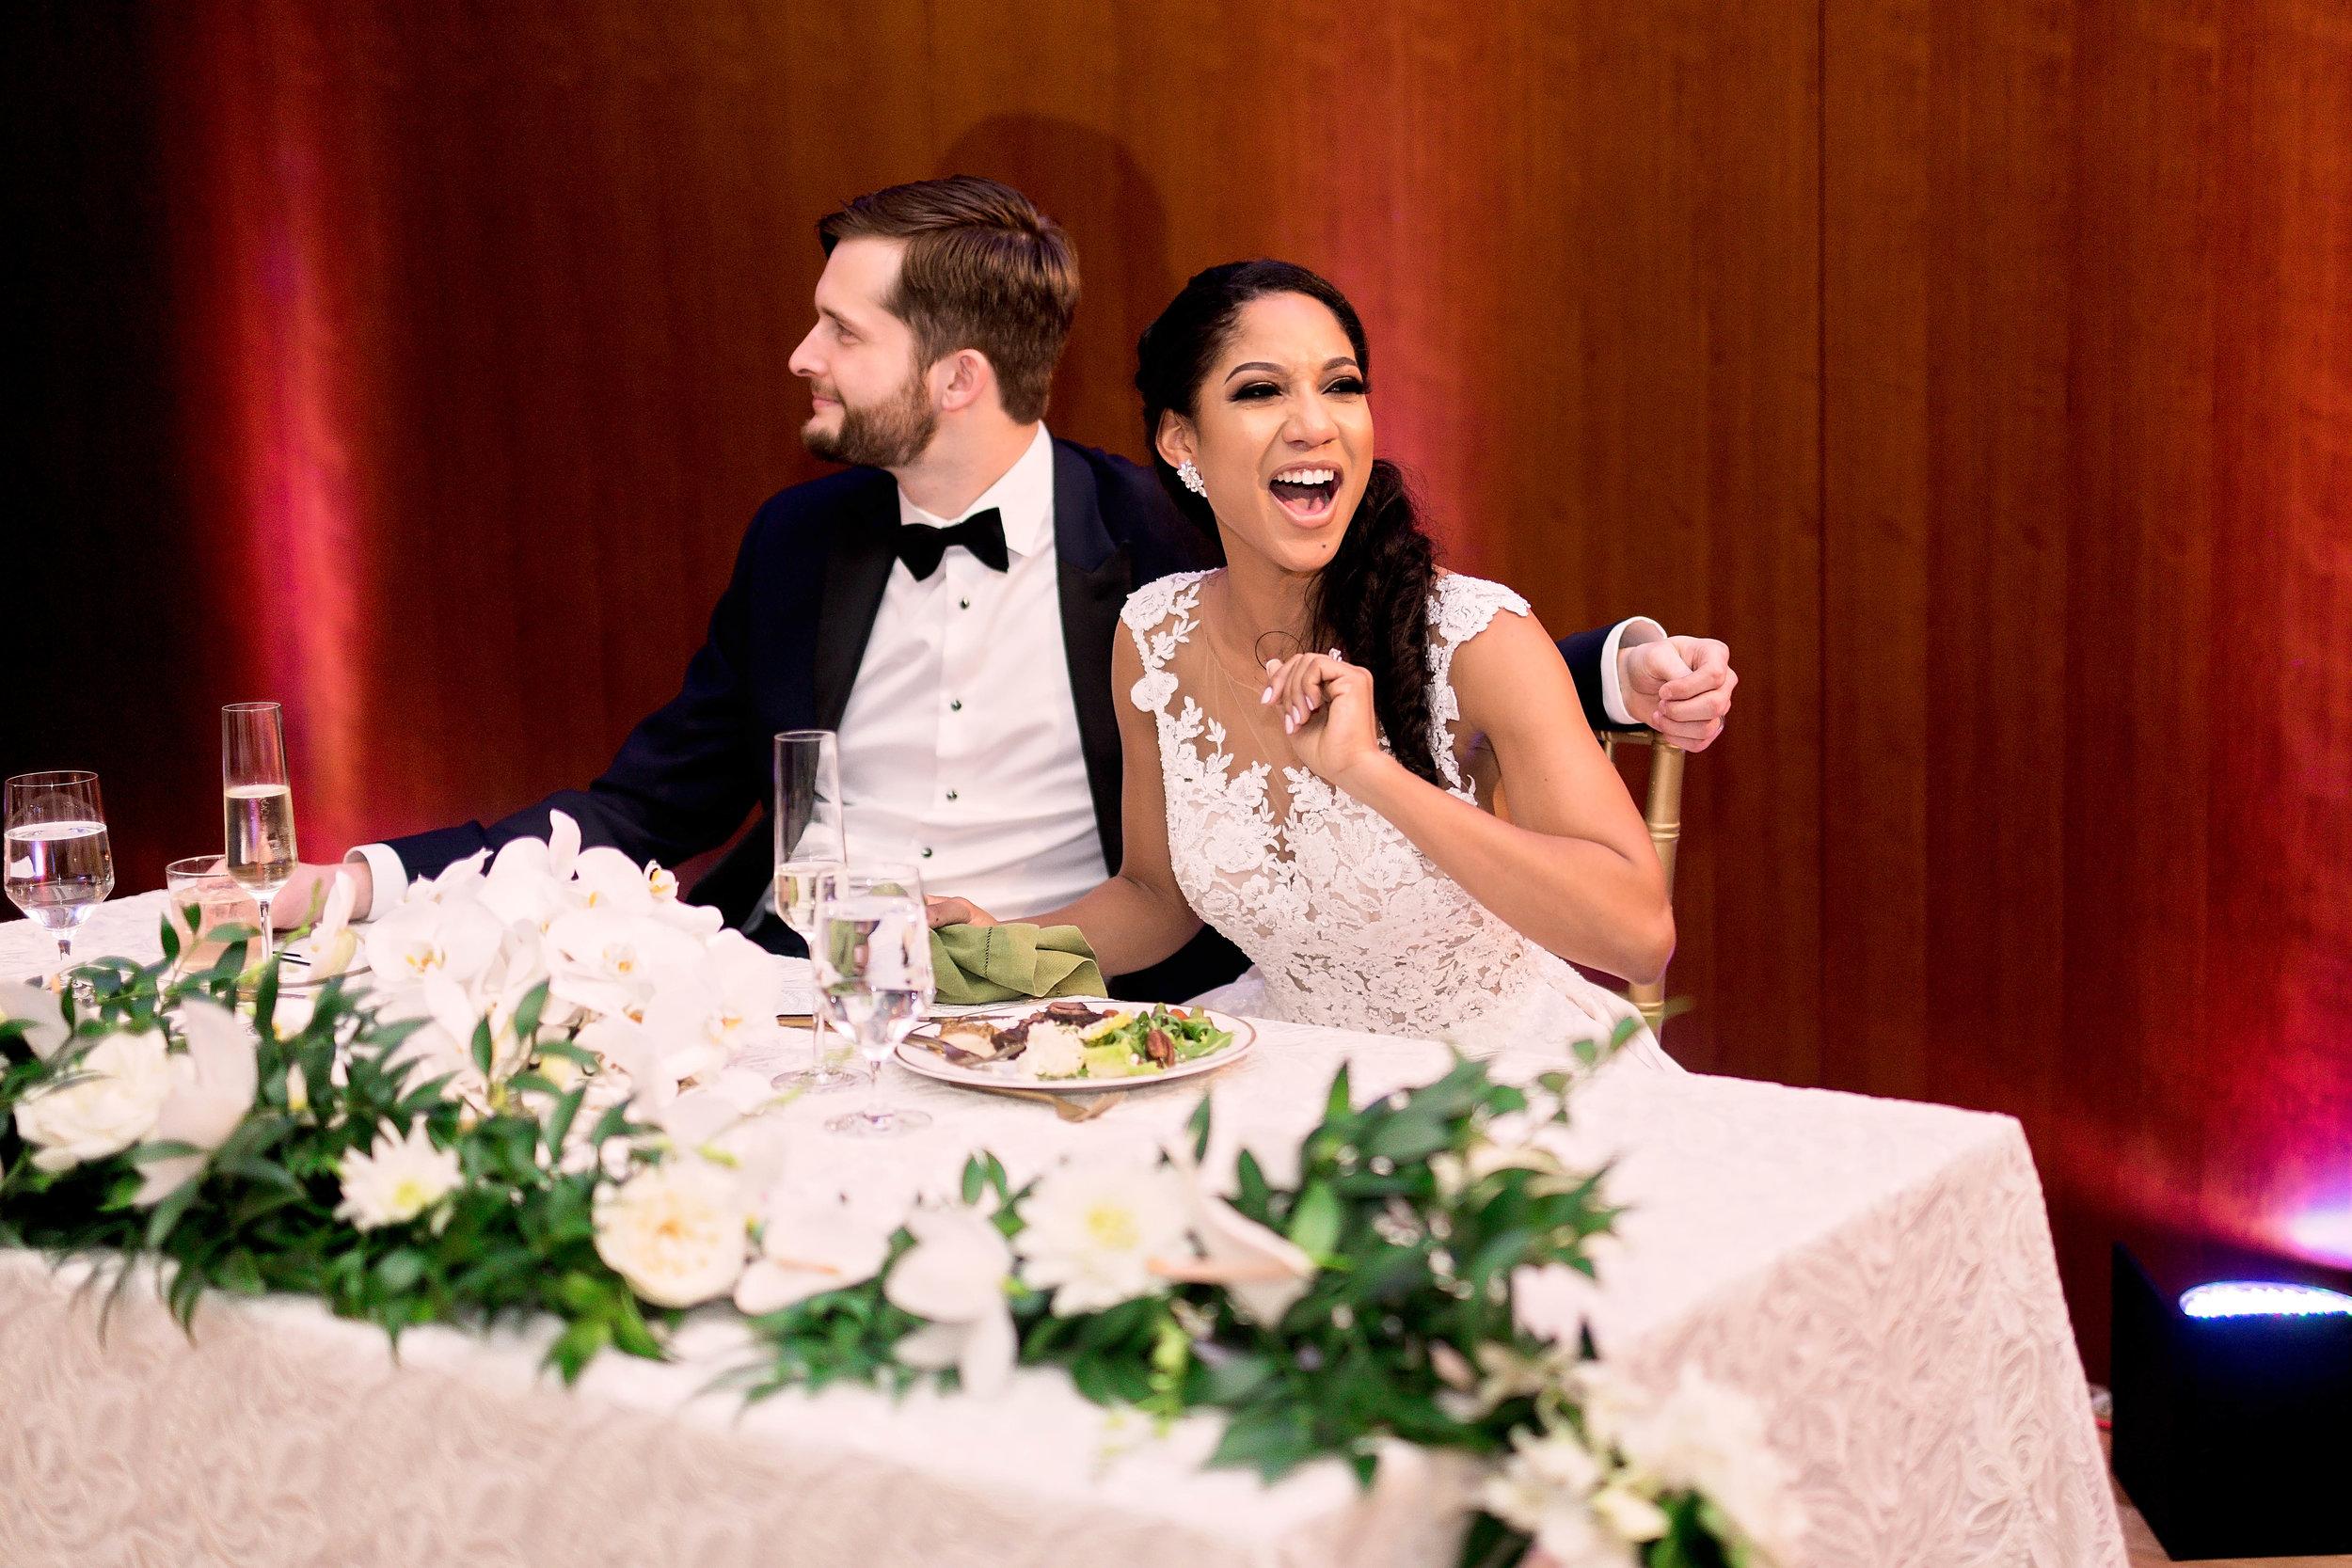 Houston Wedding- Pharris Photography- Reception- Natalie + Mark- Bride & Groom